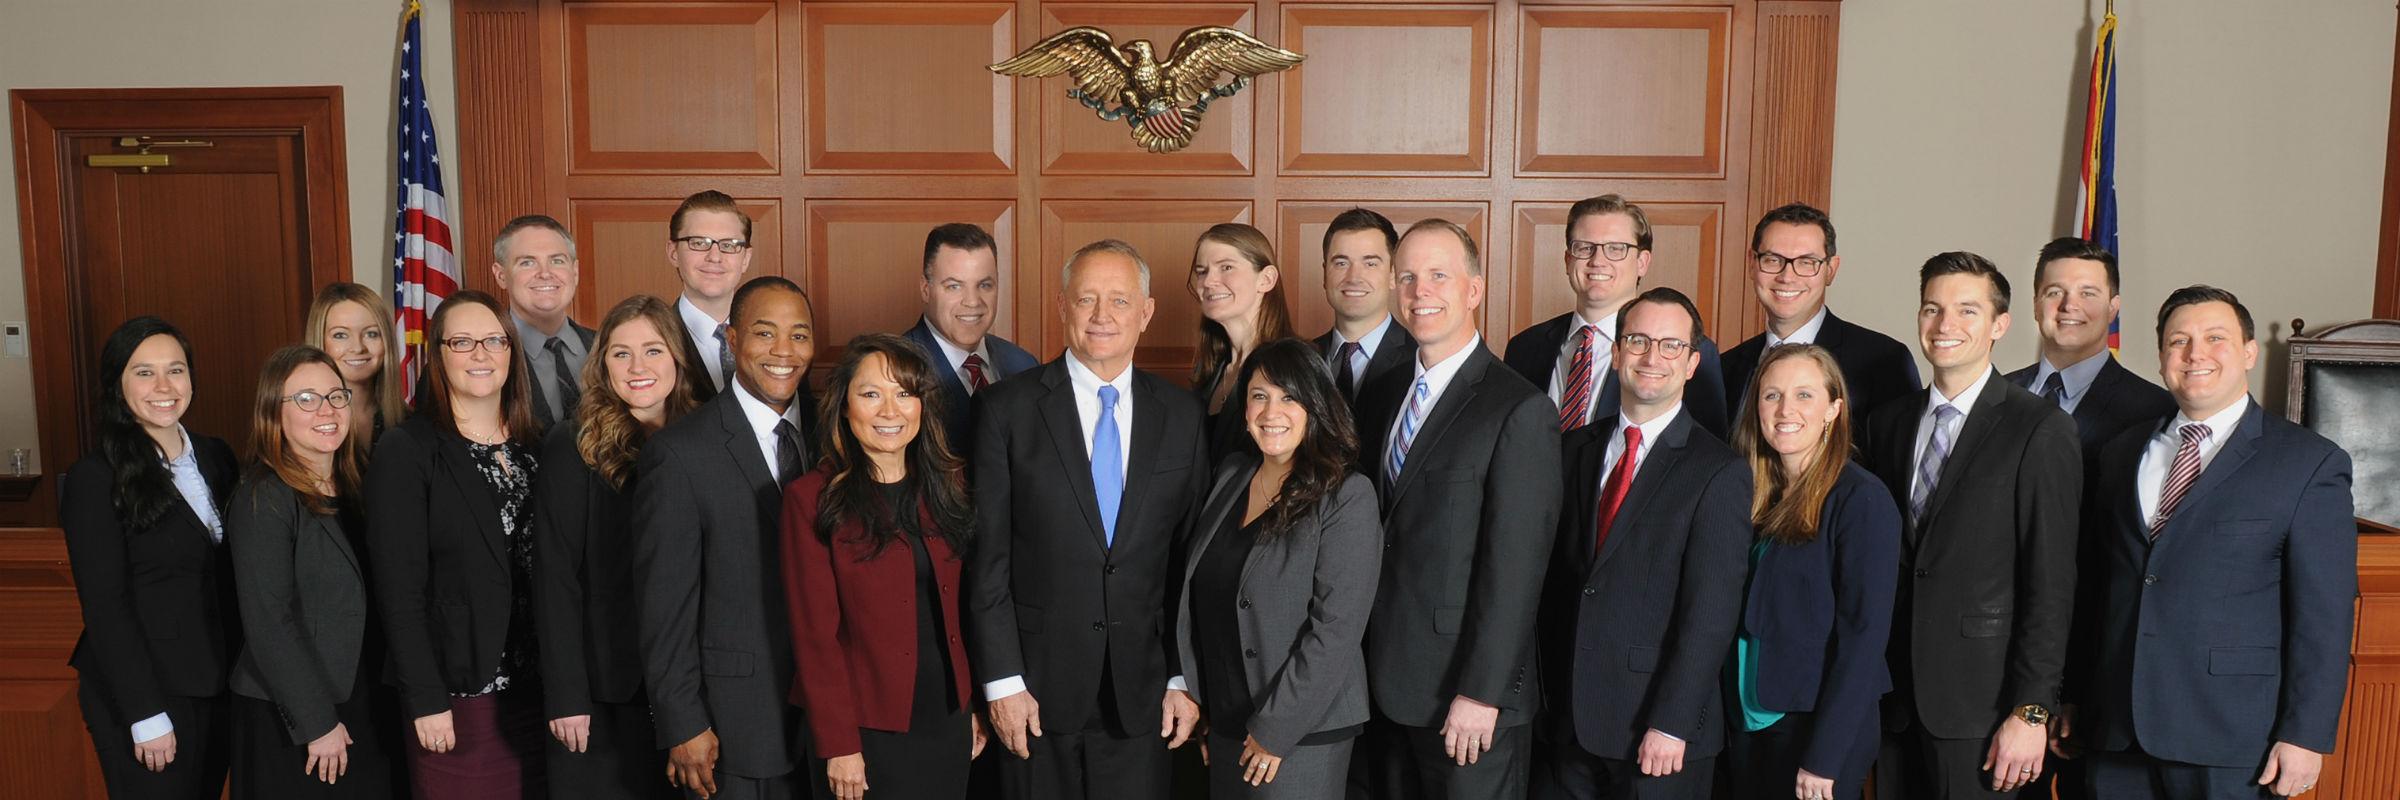 Municipal and Juvenile Staff with Prosecutor Joseph T Deters